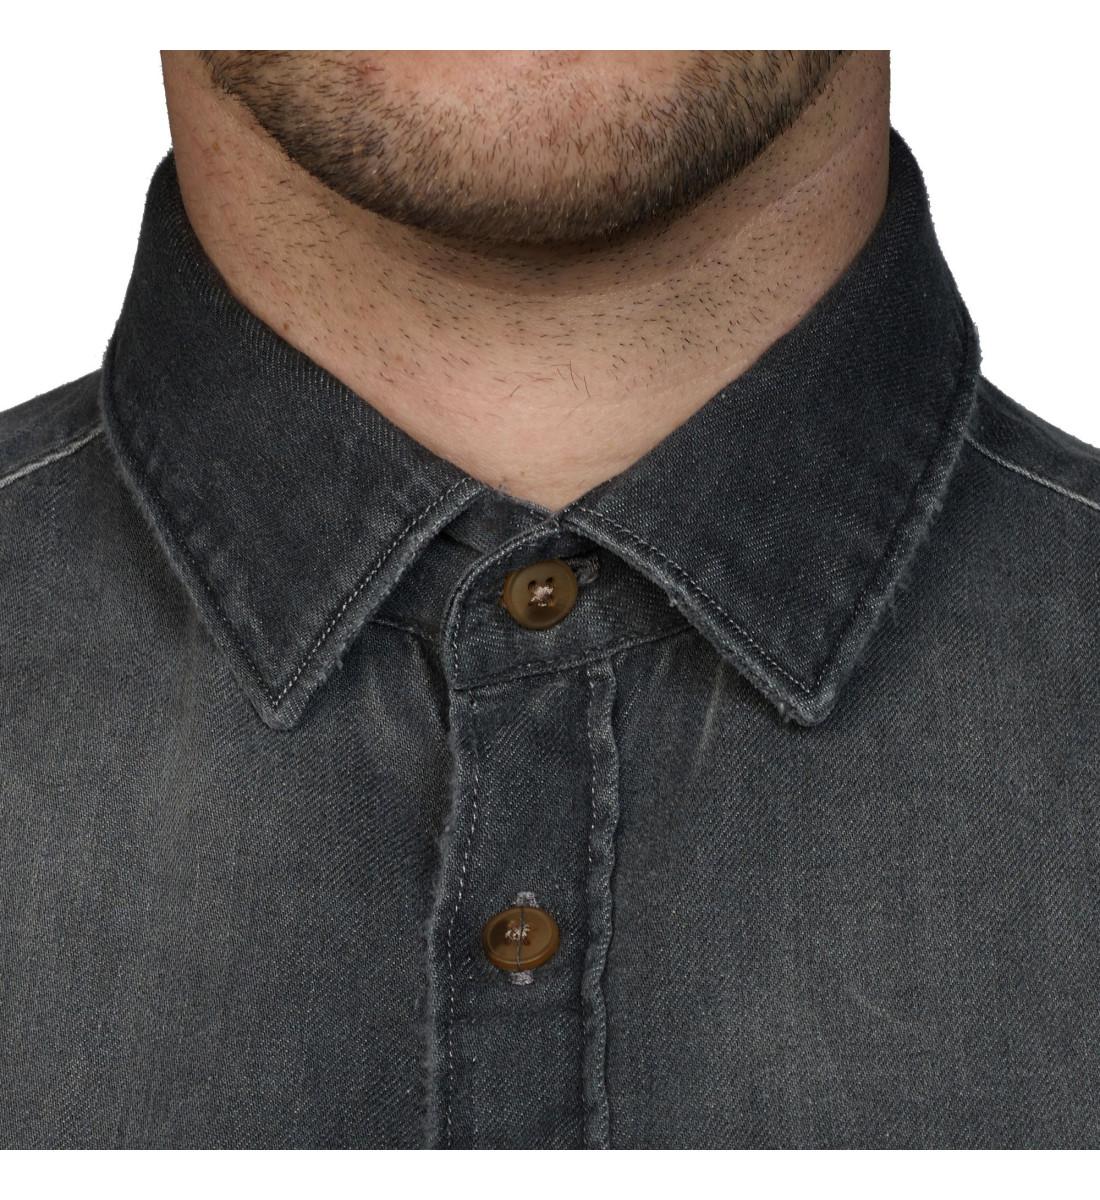 Chemise ajustée en denim noir